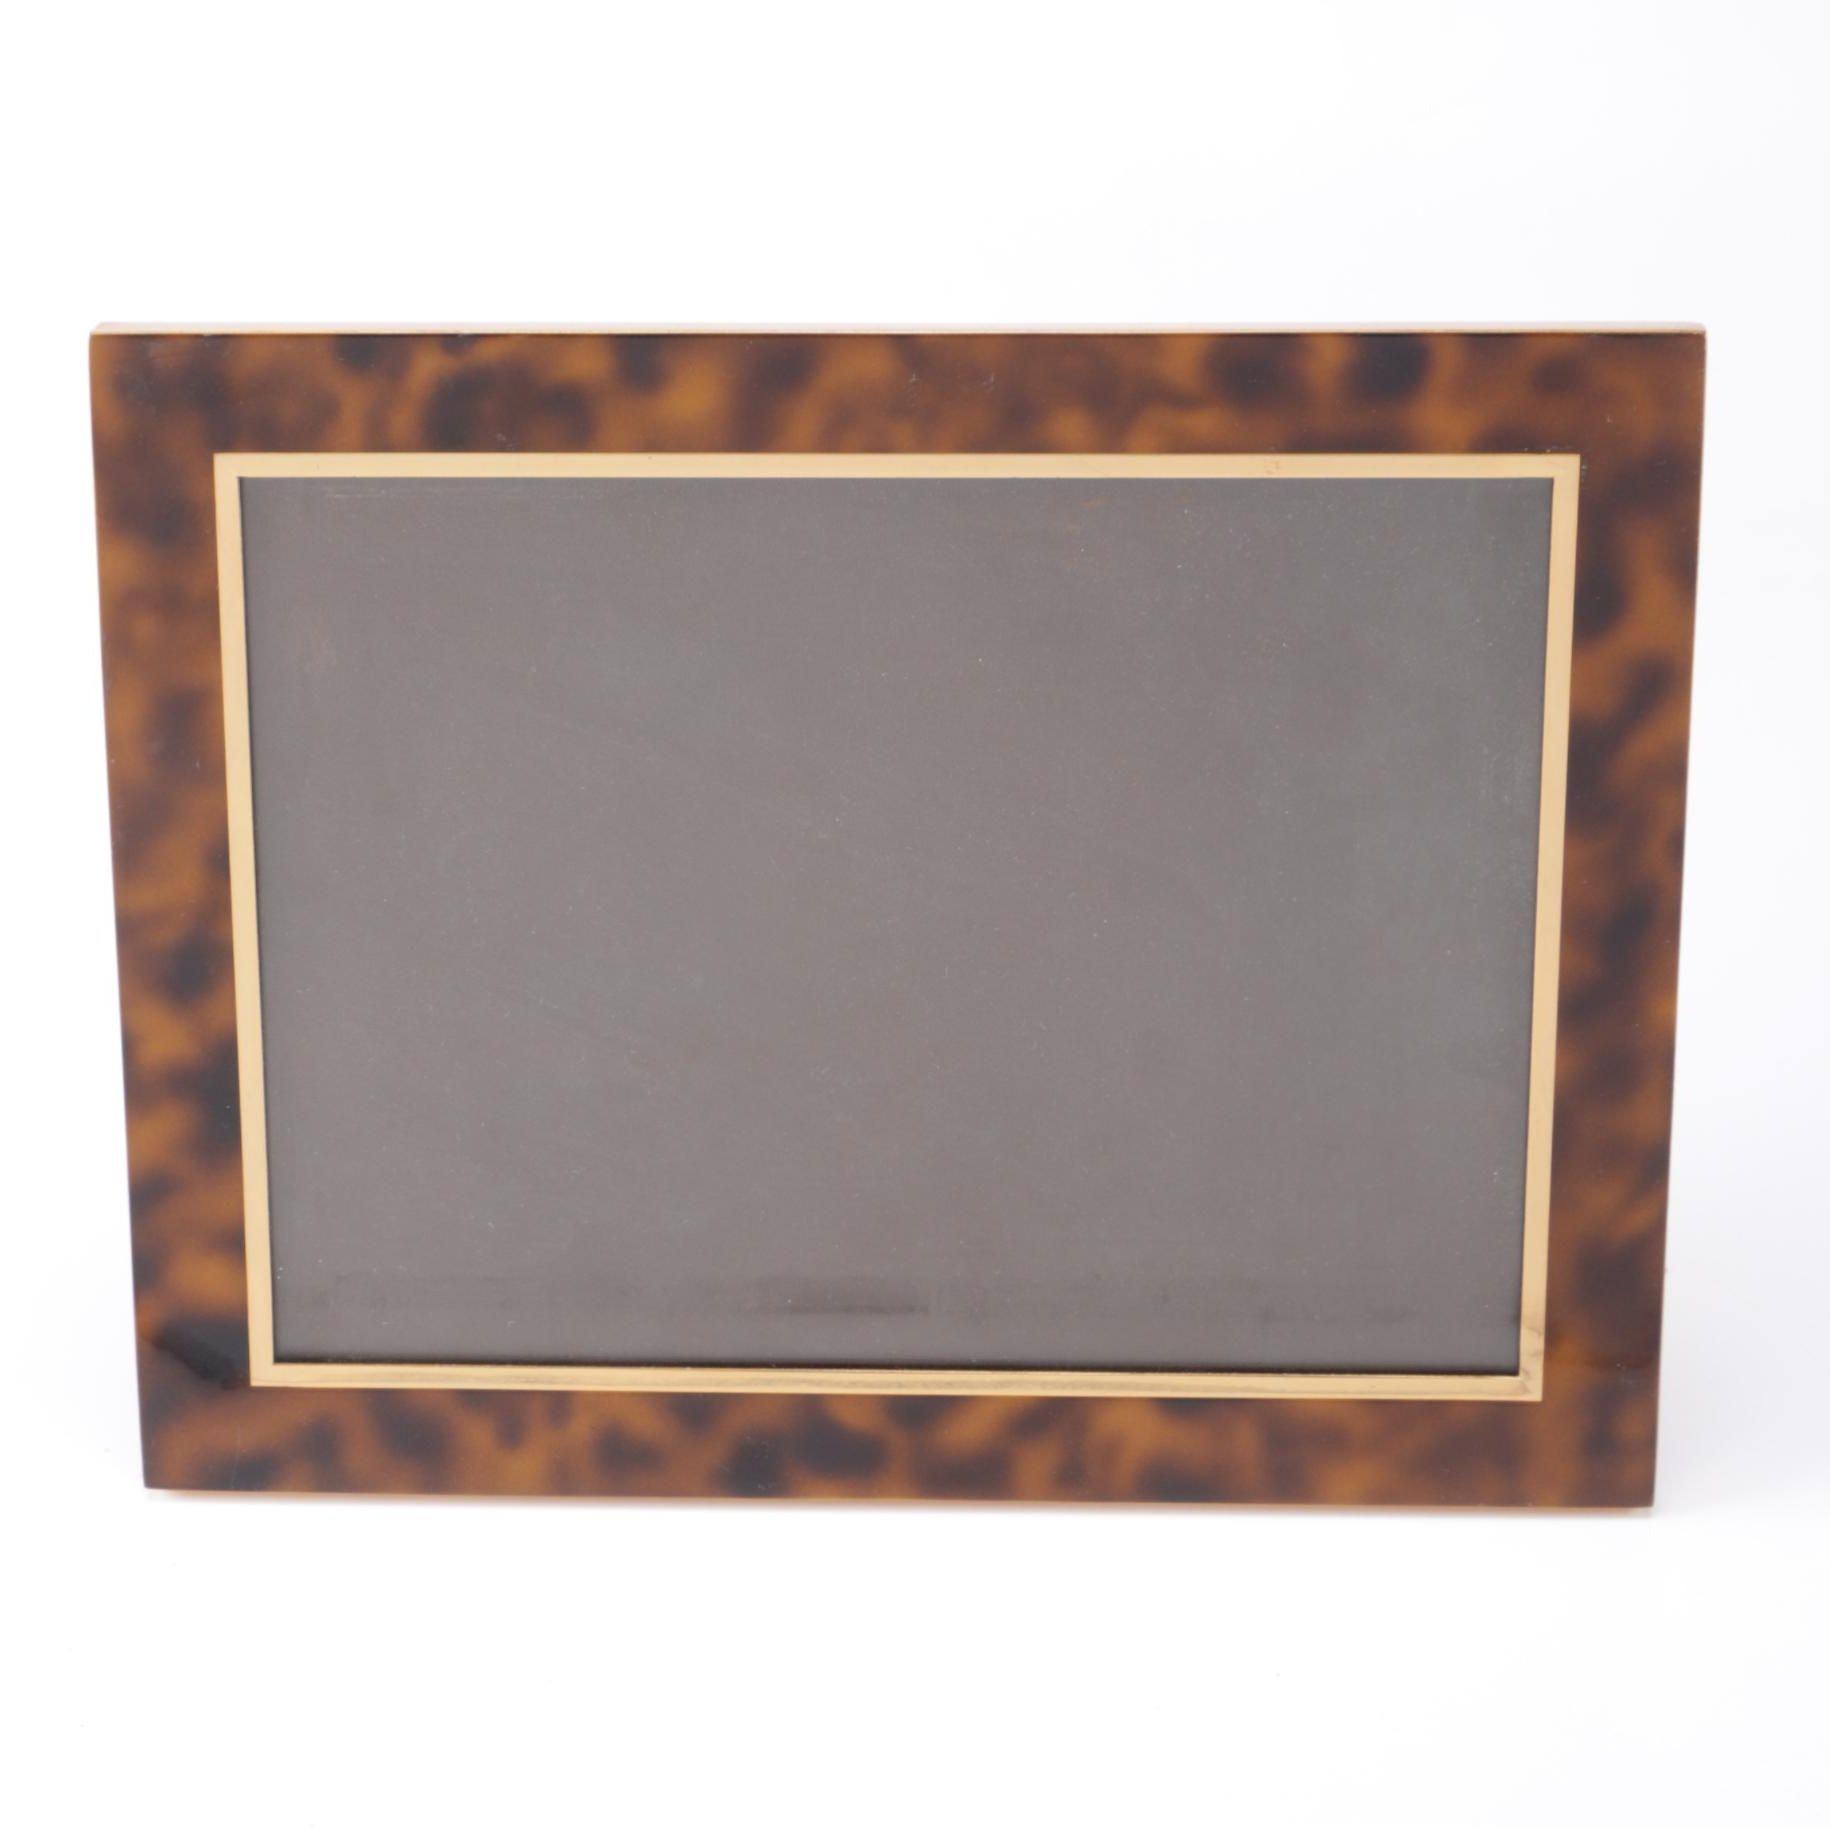 Hermes Picture Frame